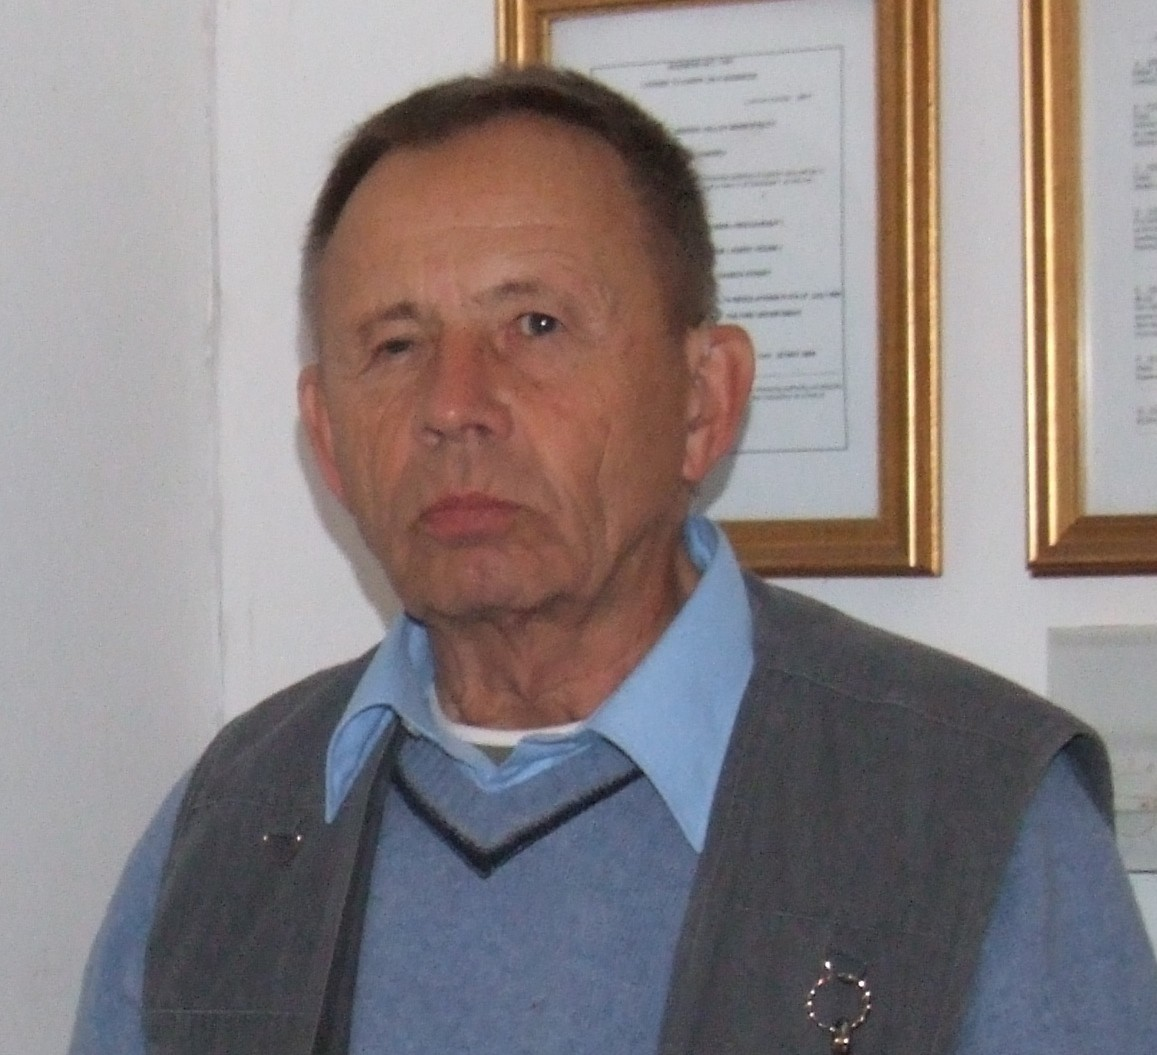 Stig Ohlson, Sweden 2001-2005, about us, wfdb